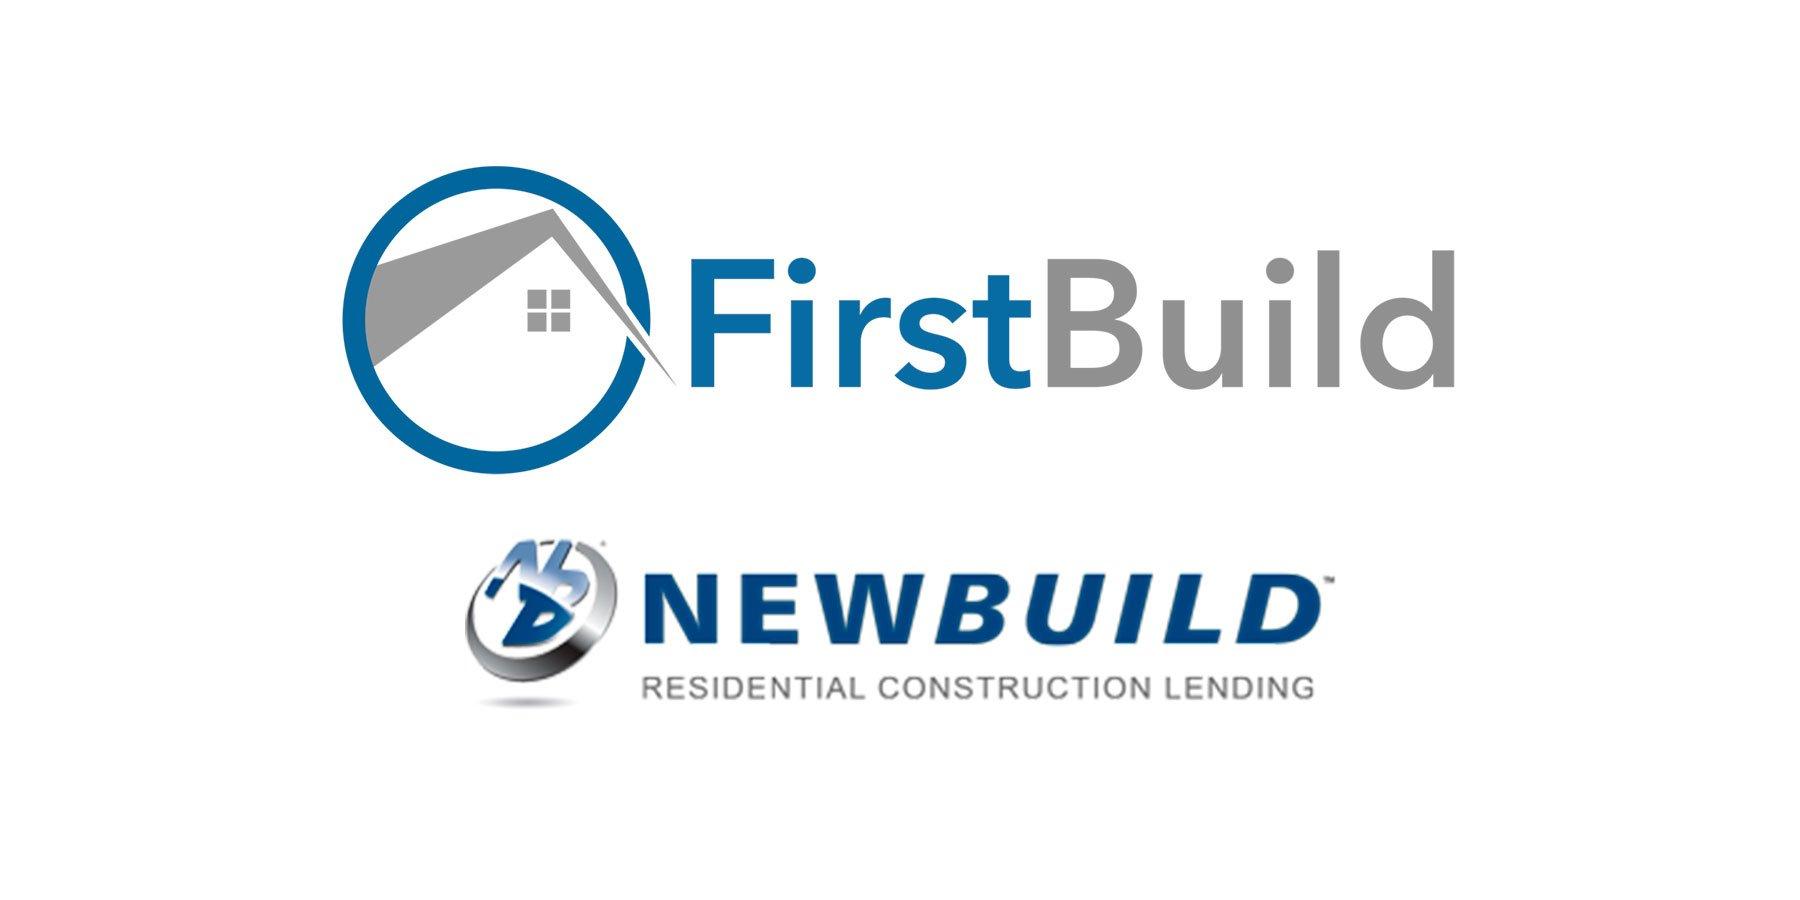 FirstBuild NewBuild Construction Finance